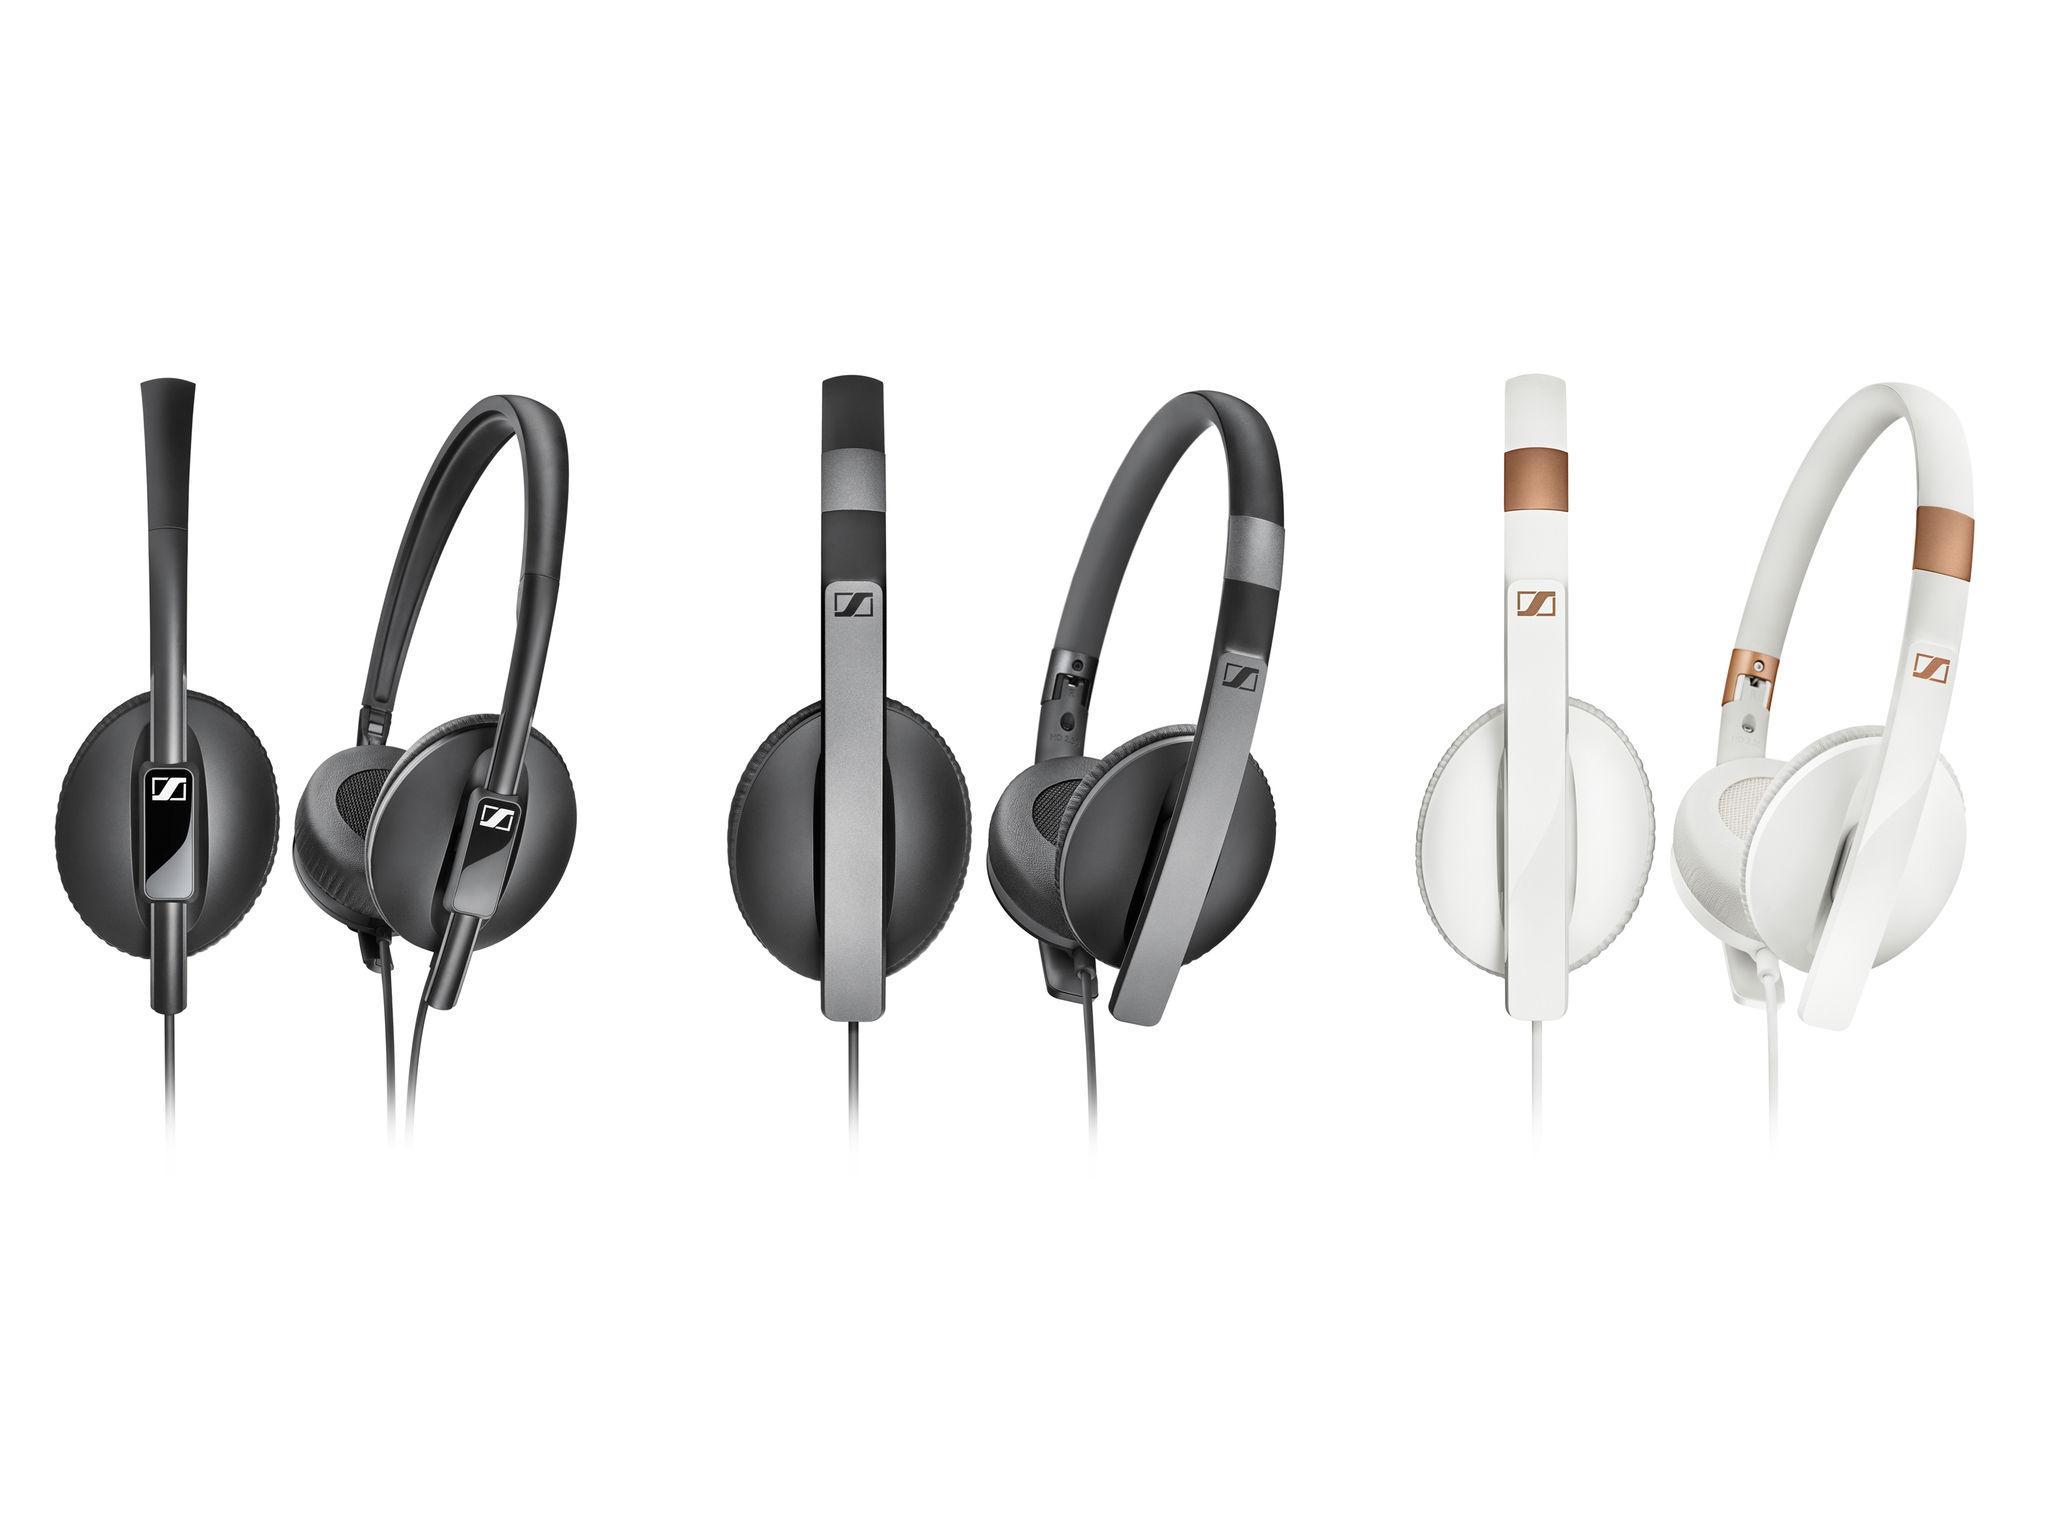 sennheiser hd 2.10 on ear headphones review